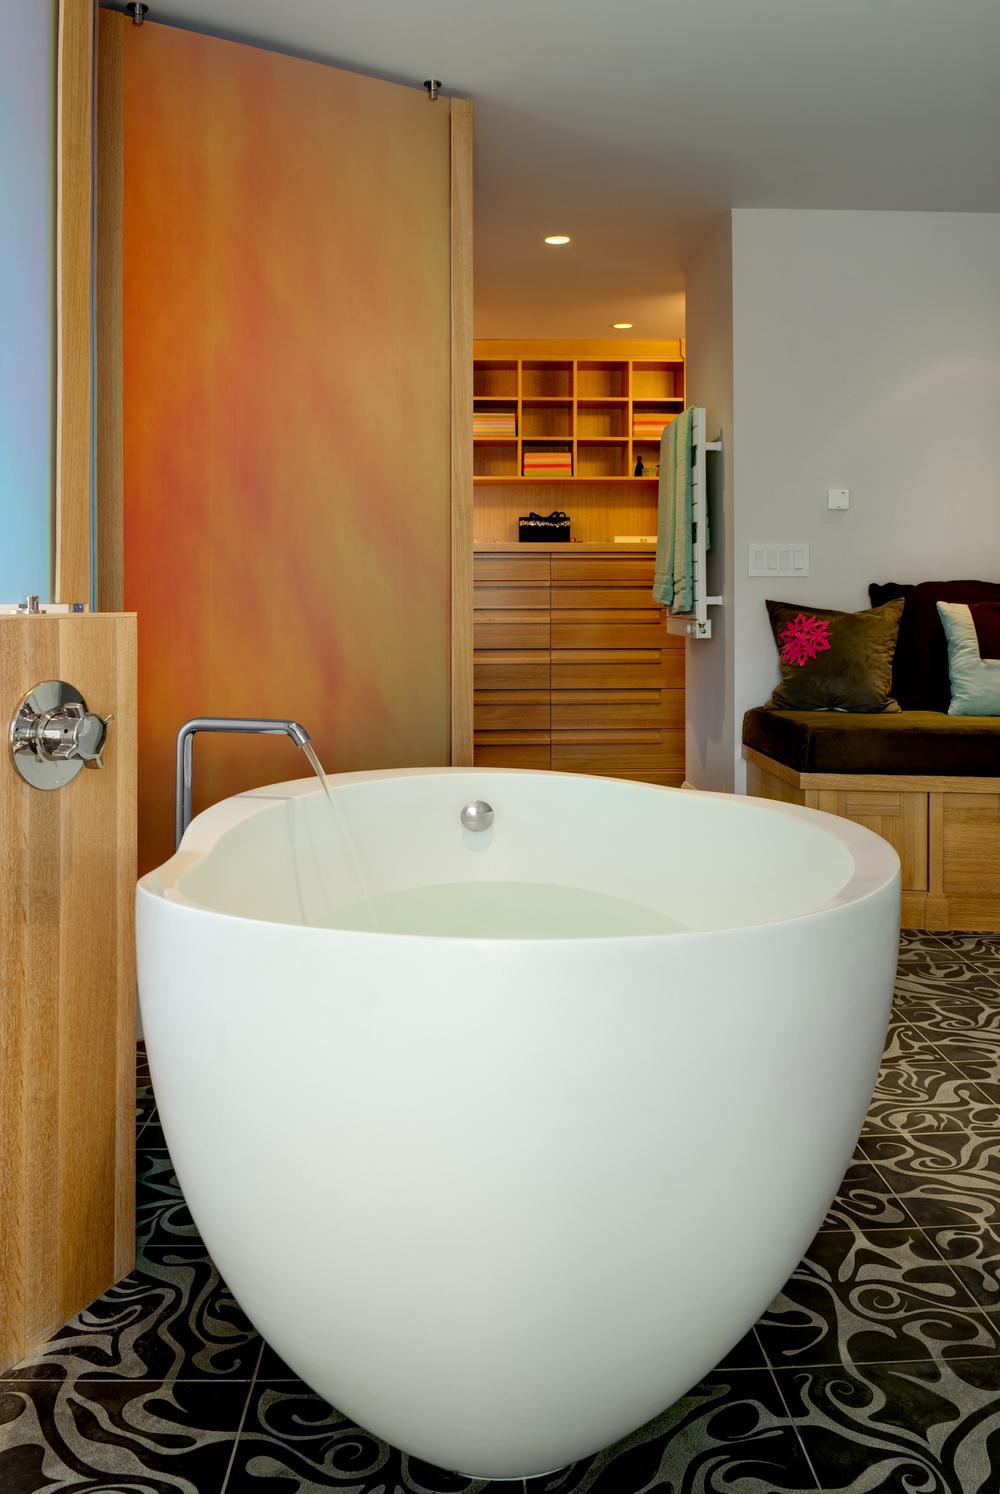 5 Henderson_Stokes bathtubSSFB.jpg